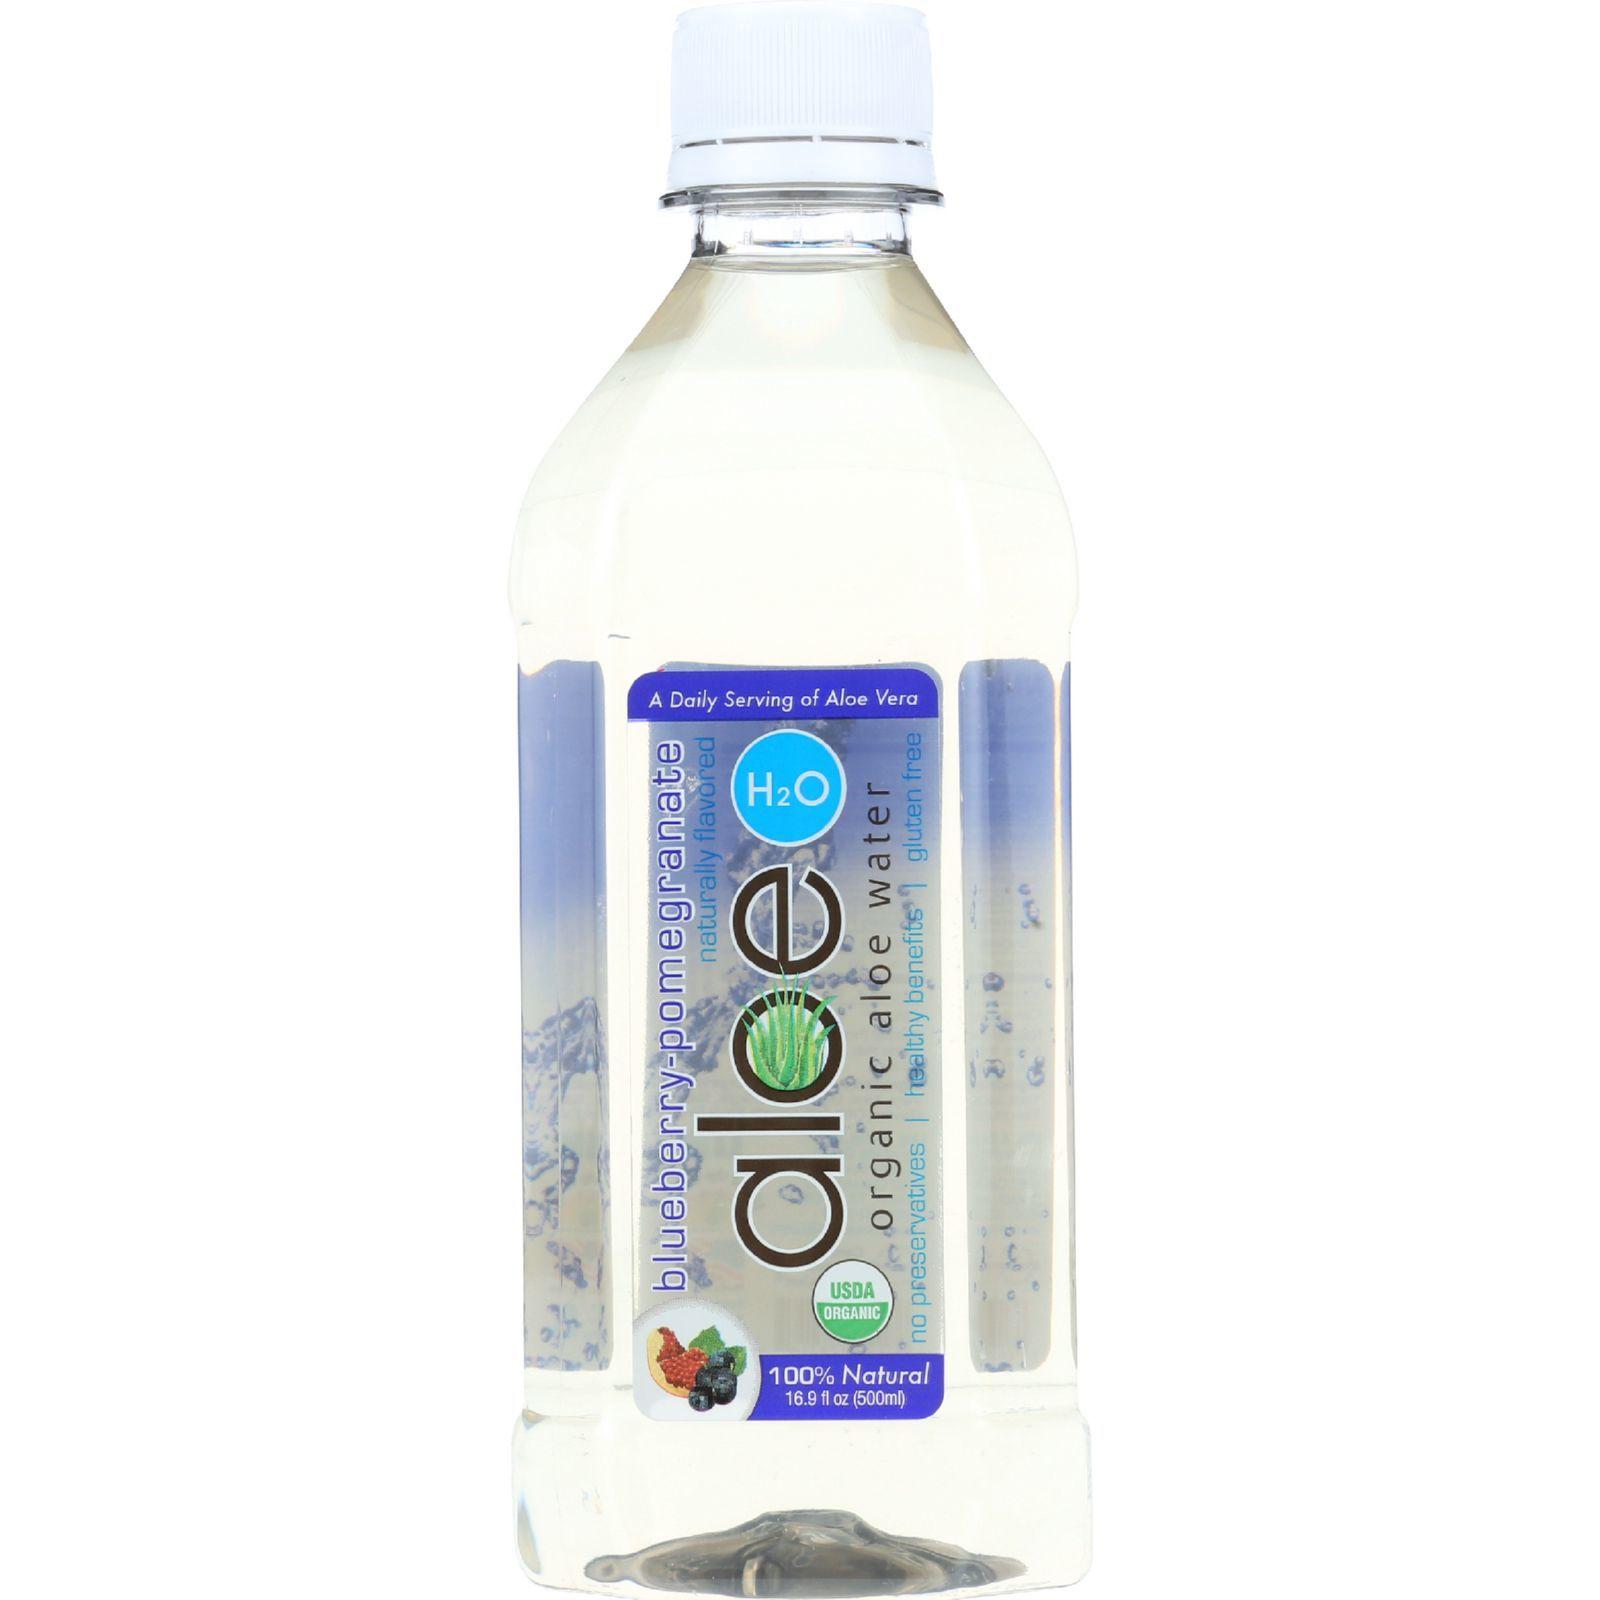 Lily Of The Desert Aloe H2O - Organic - Blueberry-Pomegranate - Gluten Free - 16.9 oz - case of 12